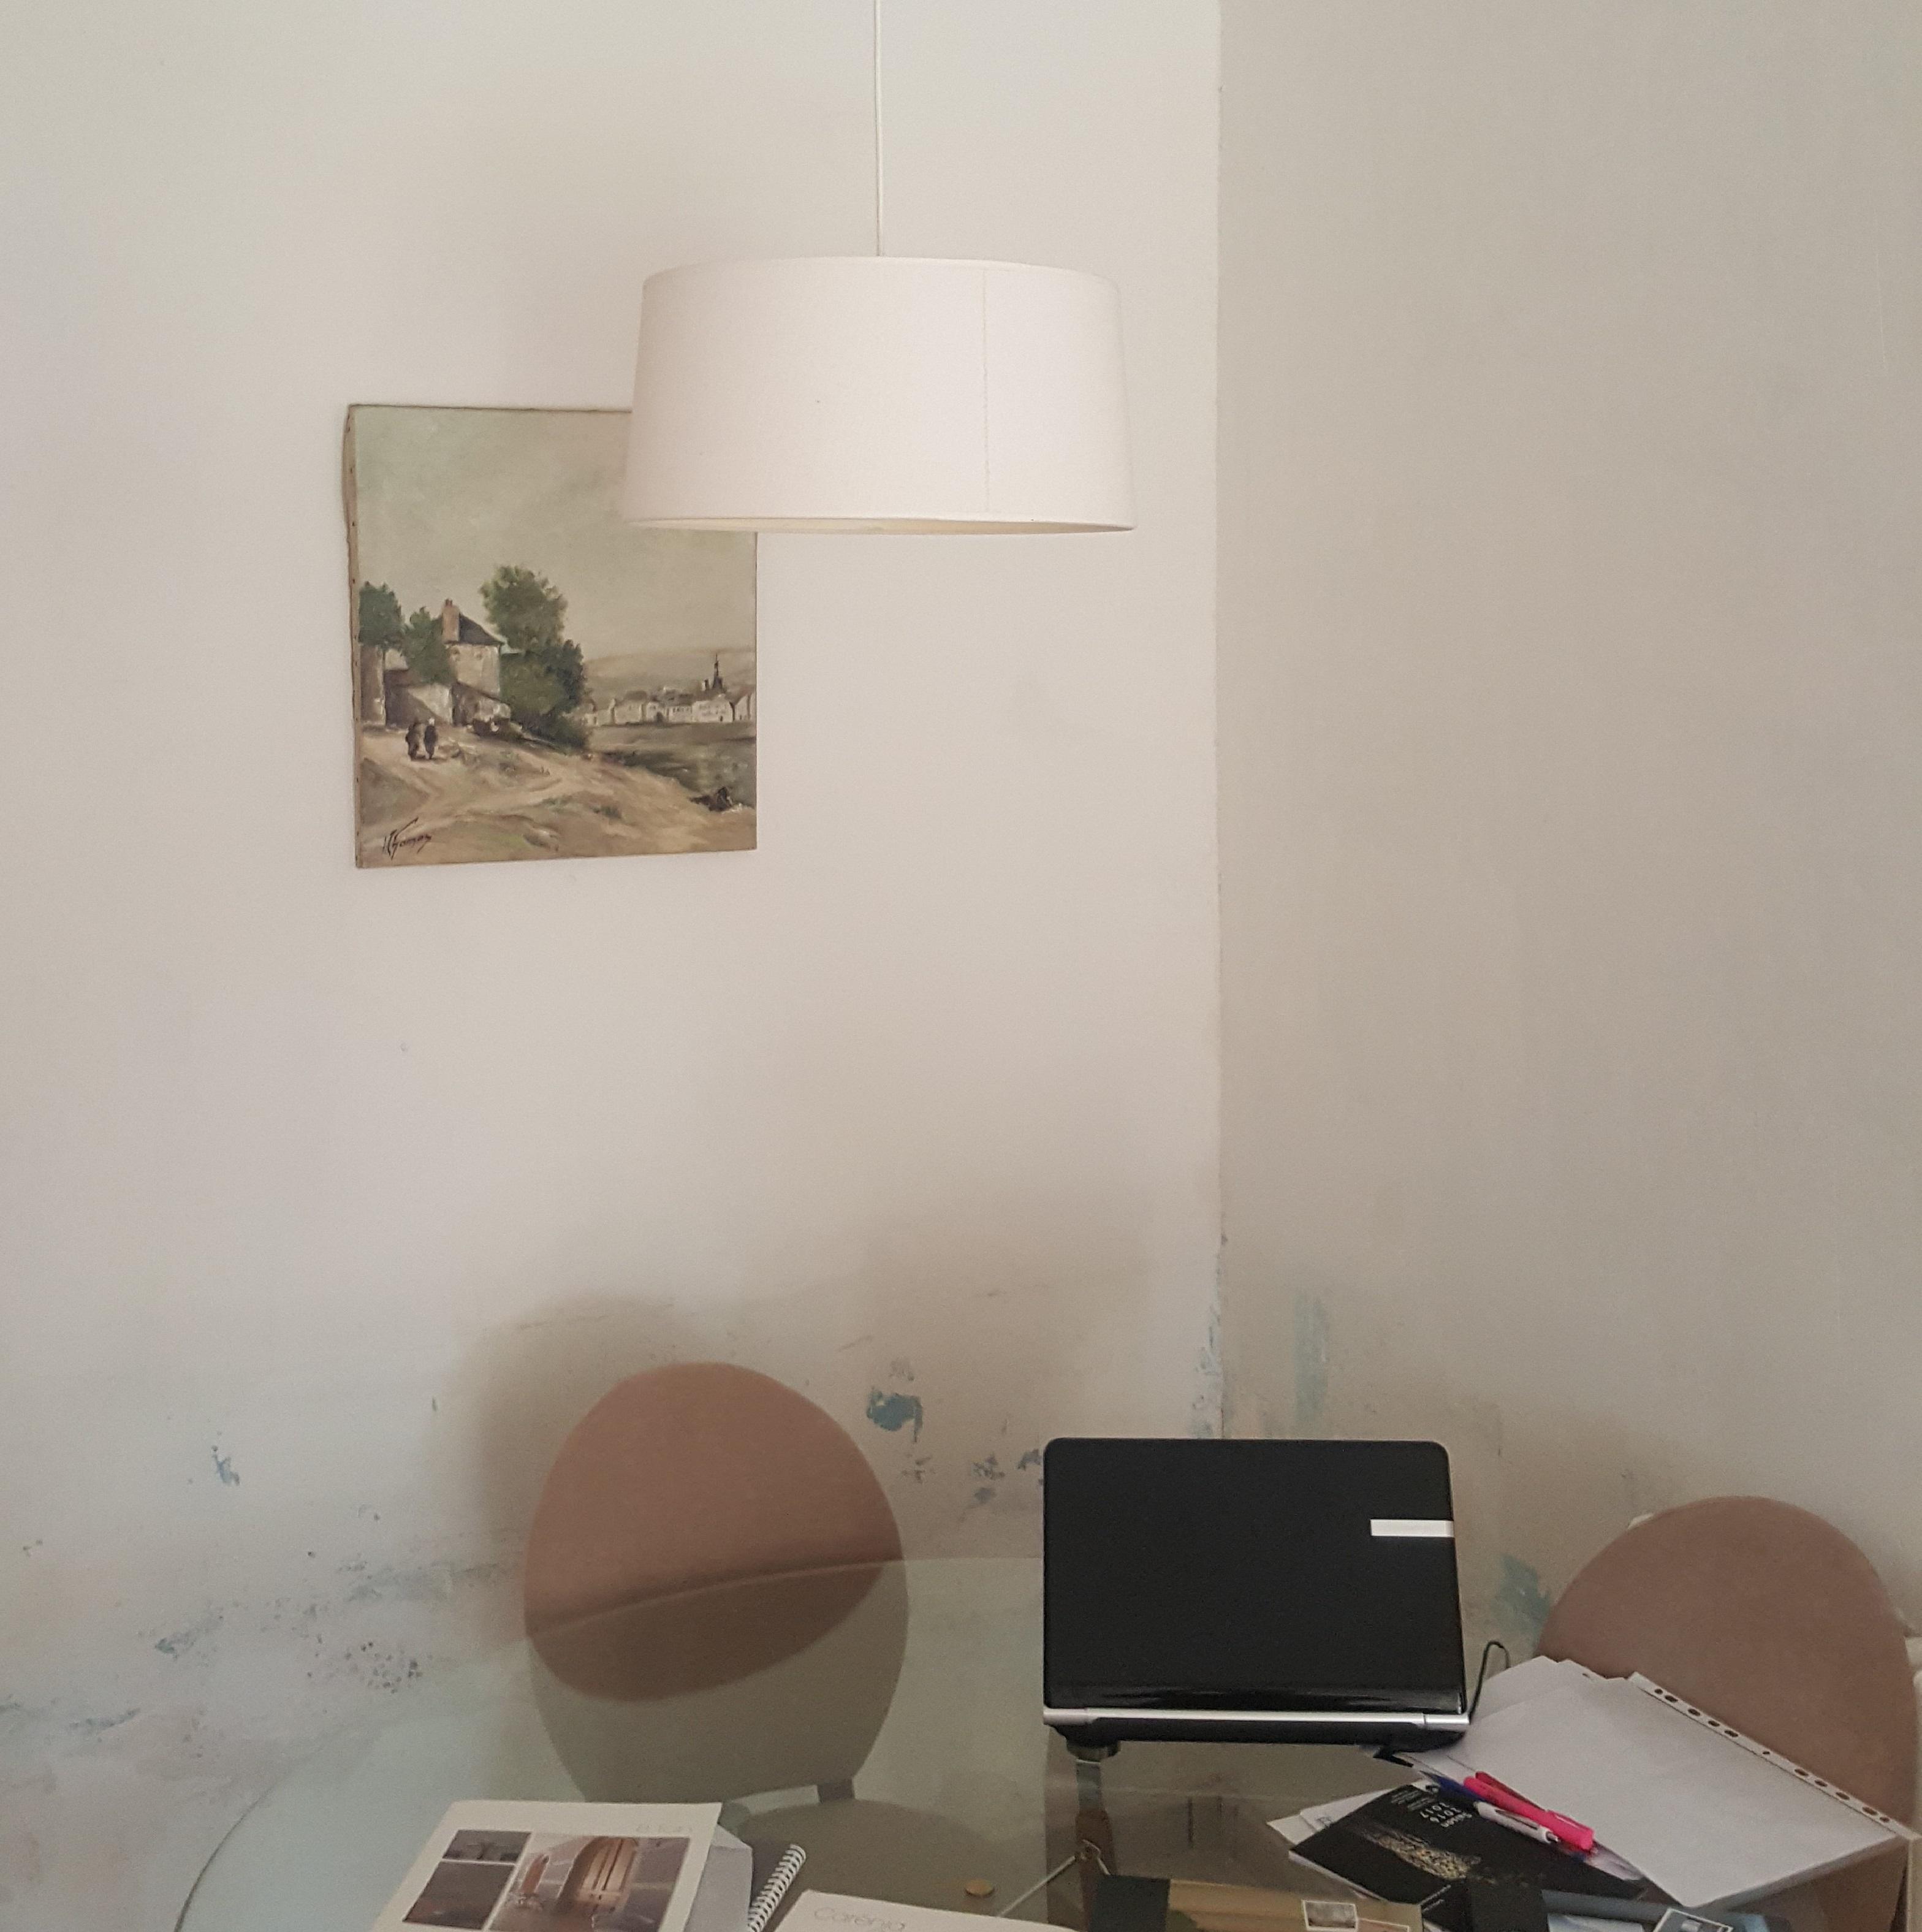 Moka décoration, artisan-peintre  Réalisations peintures